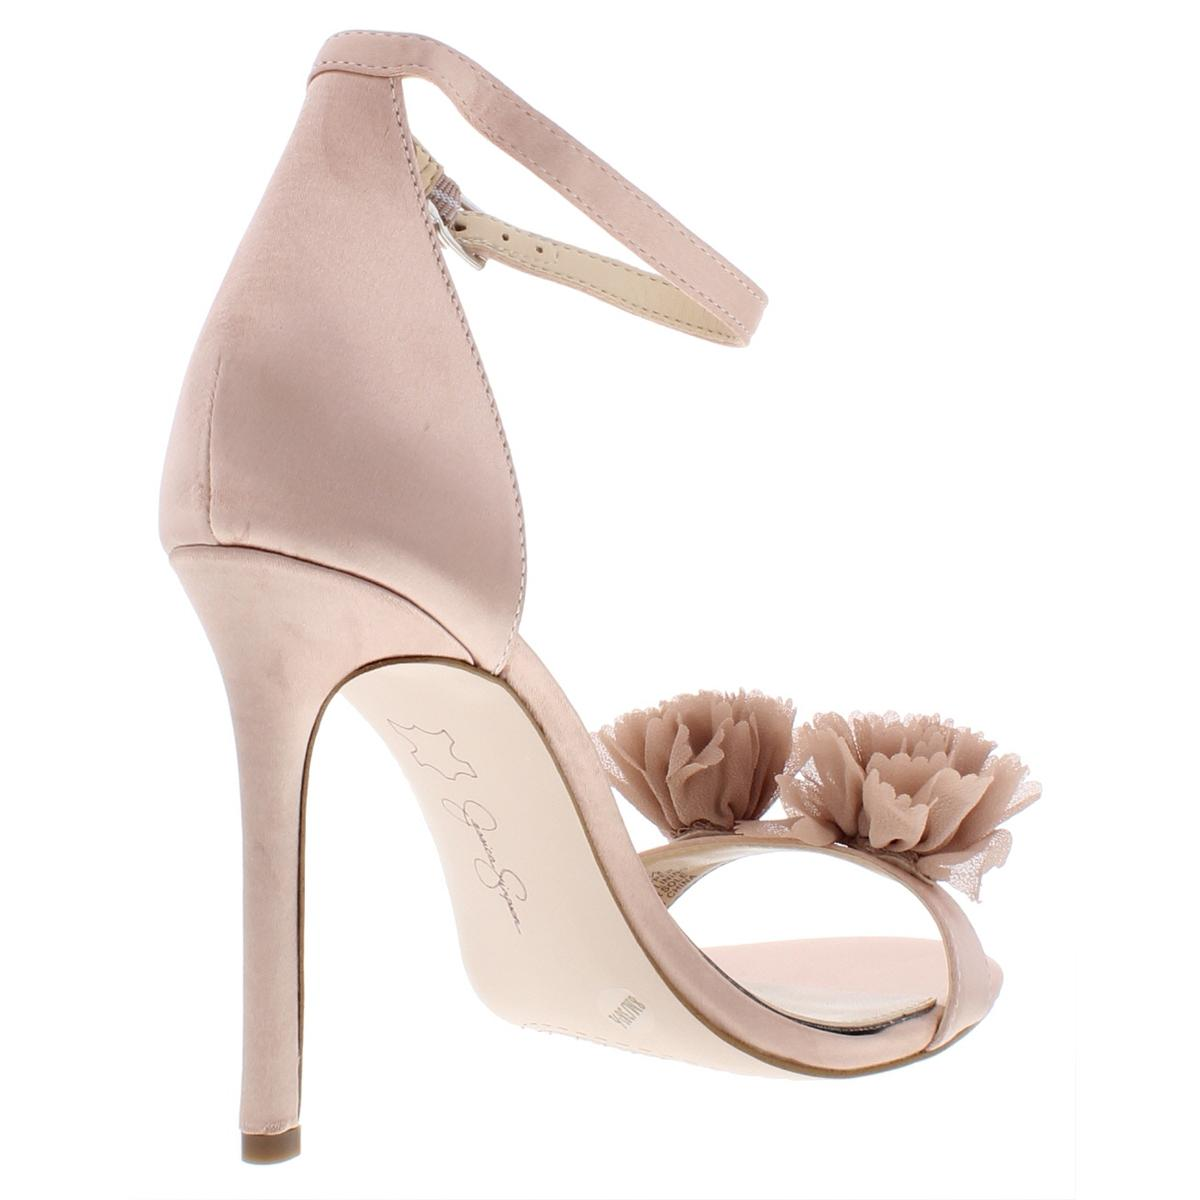 Jessica-Simpson-Womens-Jeena-Satin-Stiletto-Flower-Dress-Sandals-Shoes-BHFO-6759 thumbnail 4